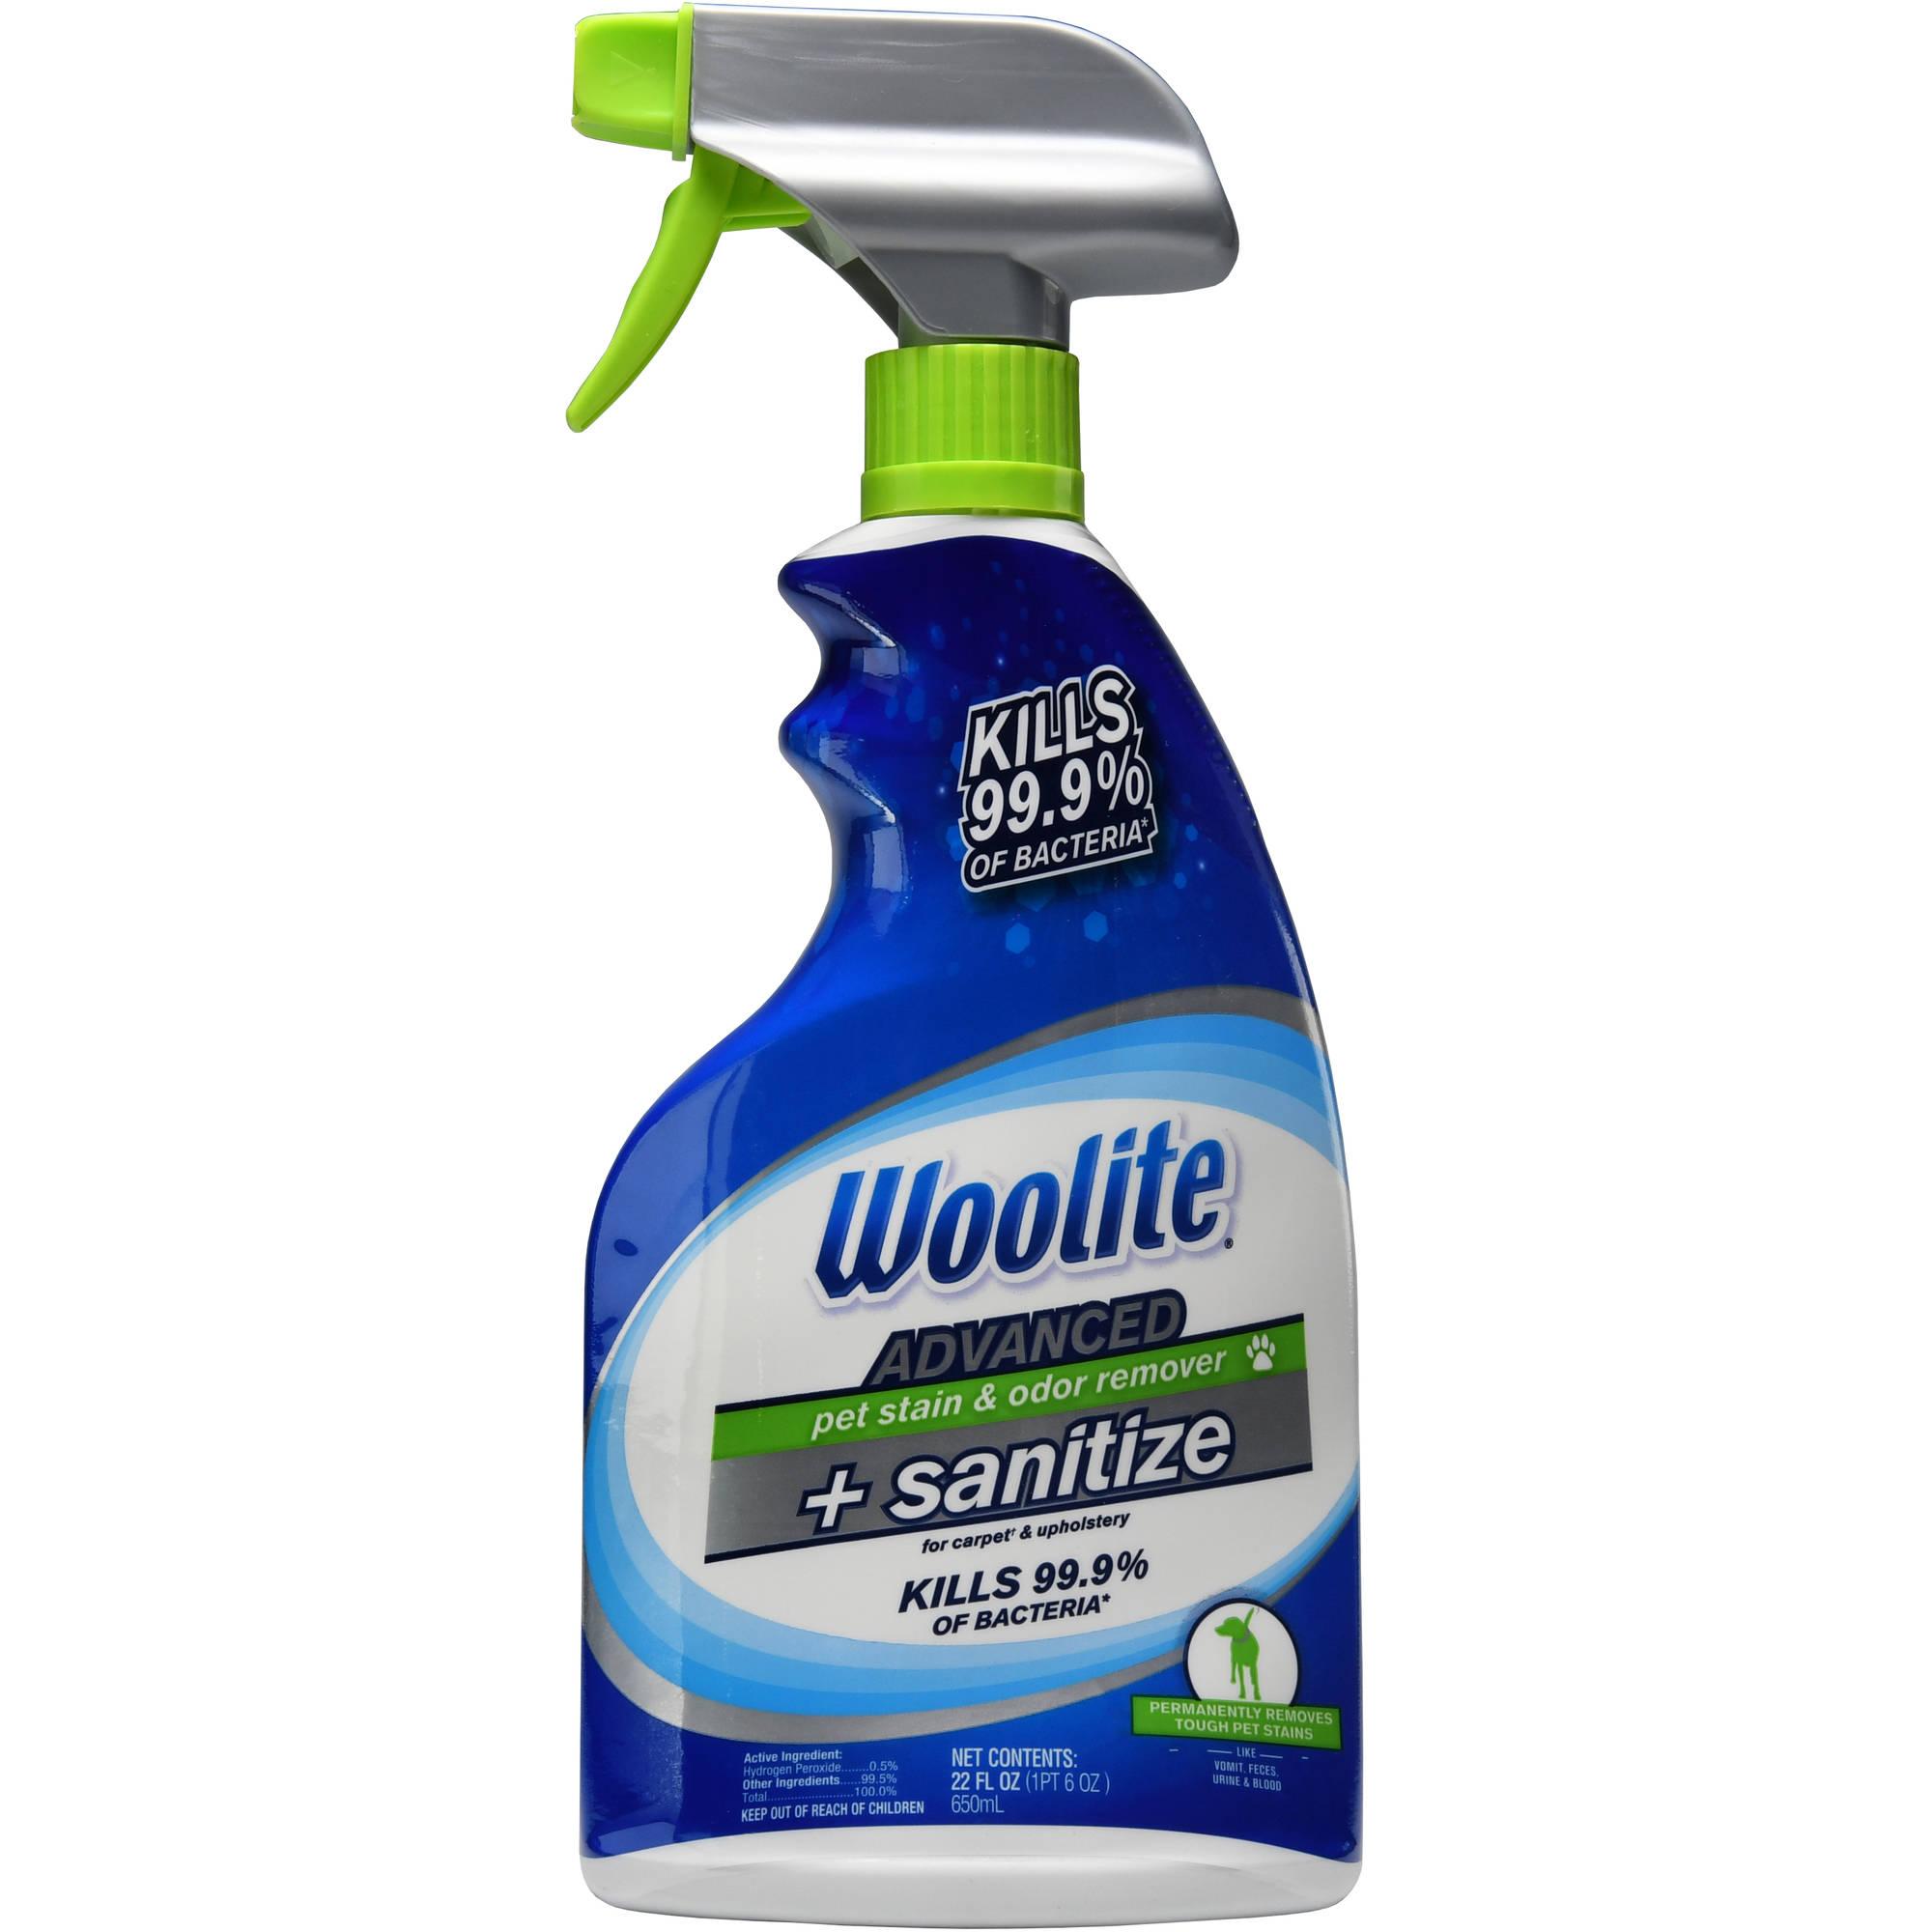 Woolite Advanced Pet Oxy Stain & Odor Remover, 22 fl oz